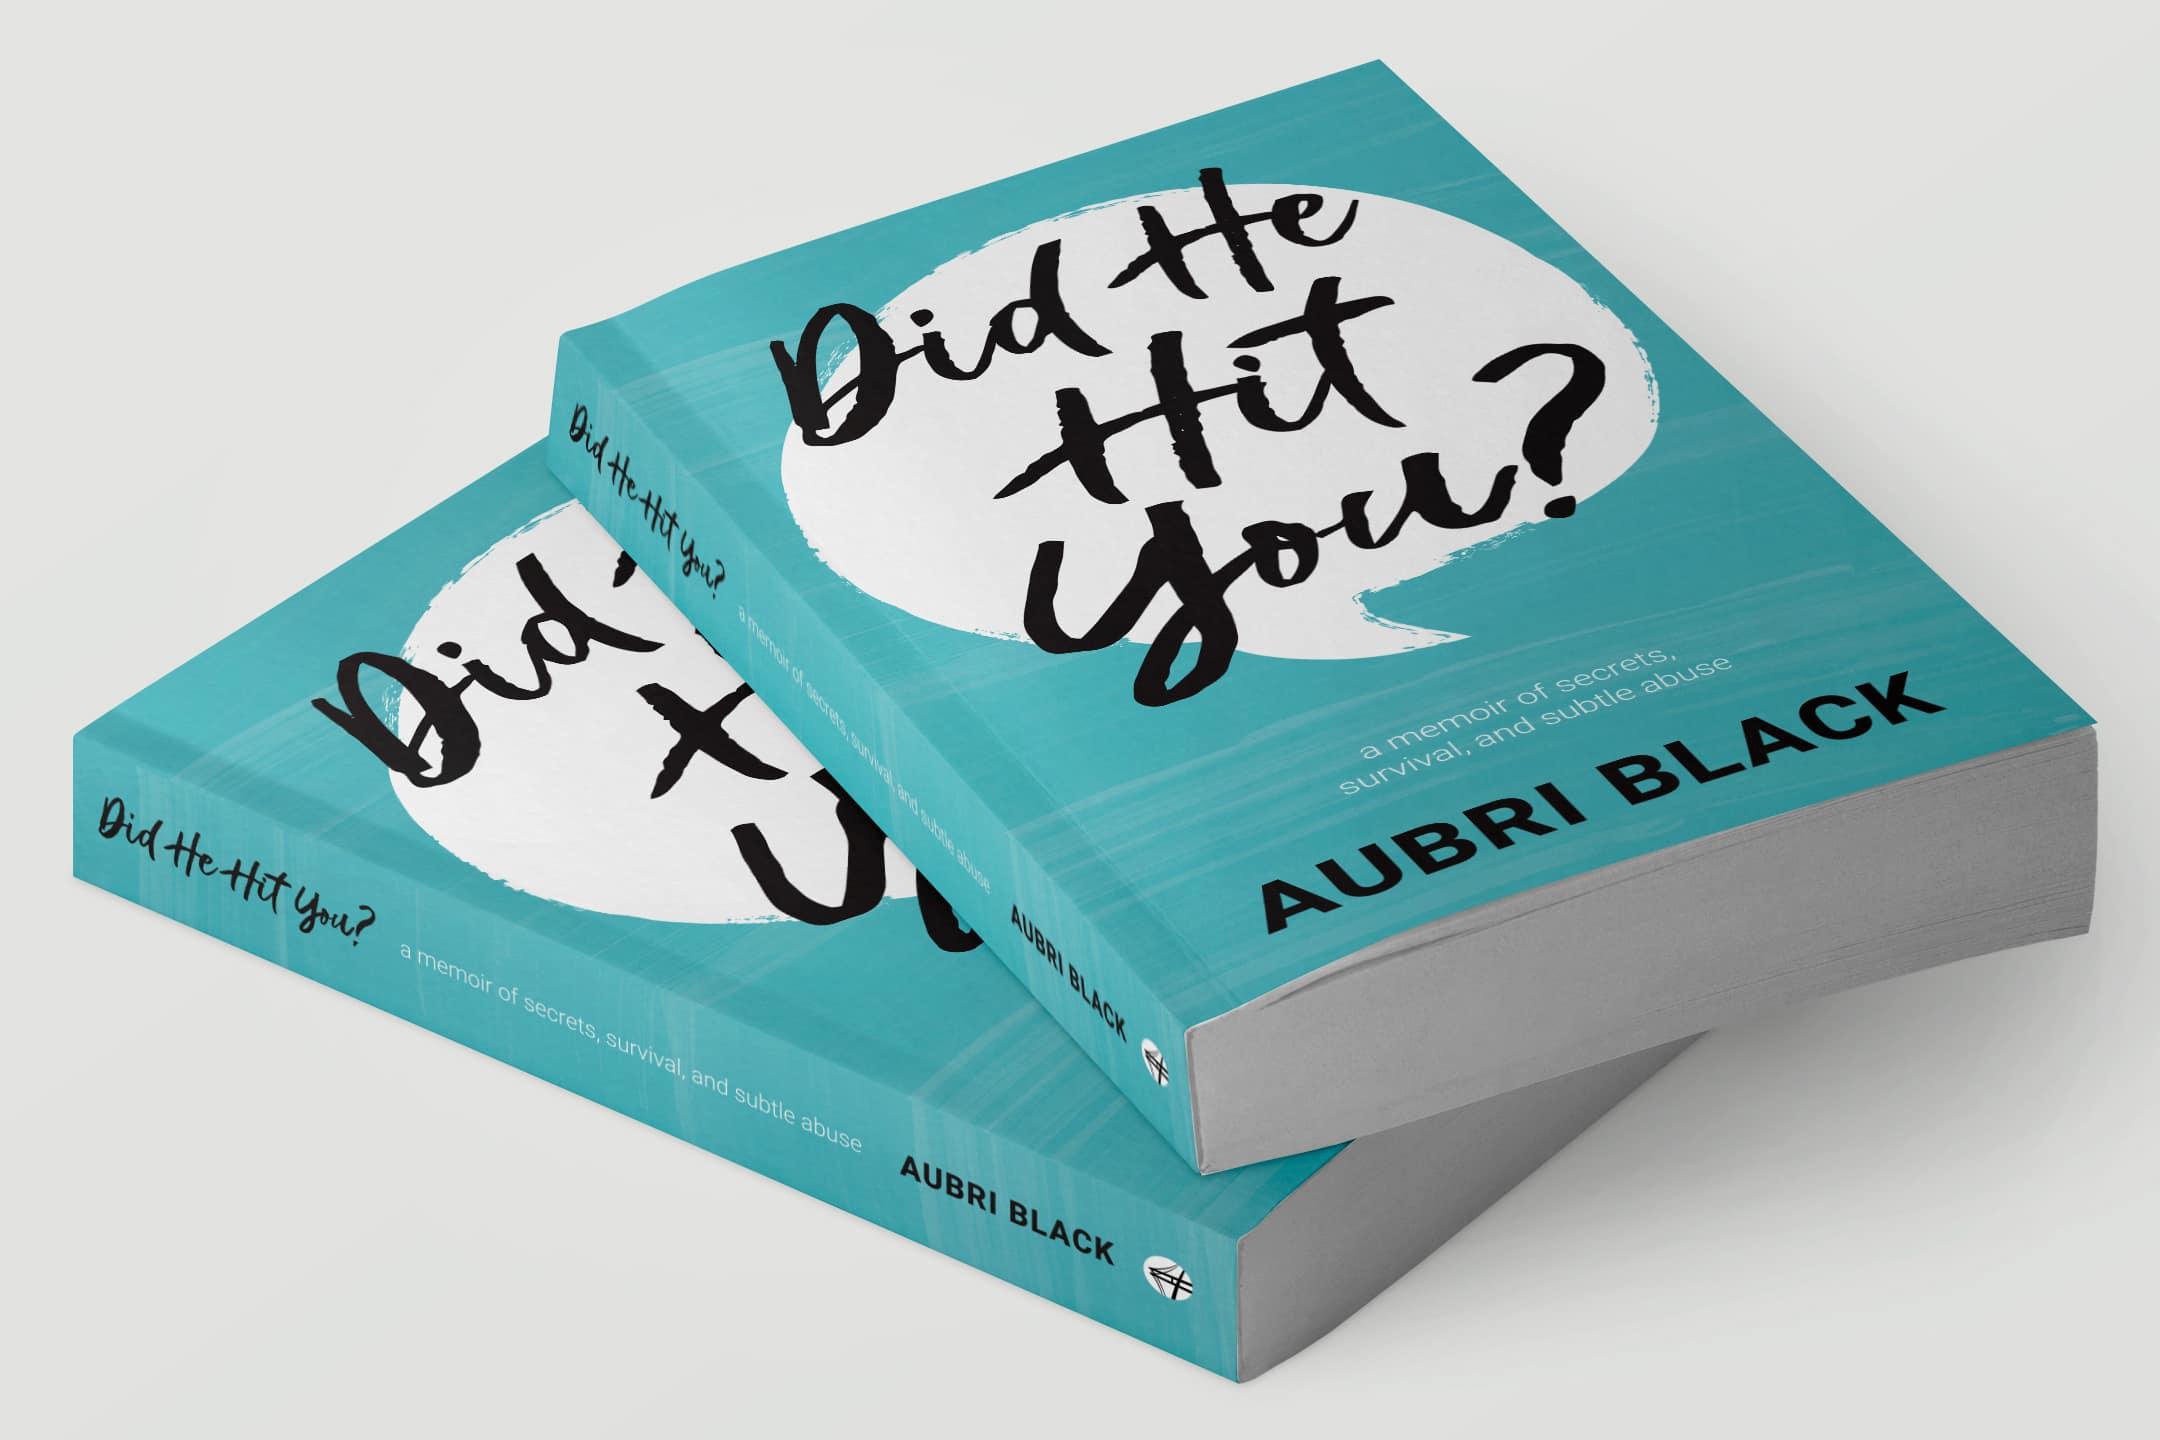 Aubri-Black-Did-He-Hit-You-Interior-2.jpg